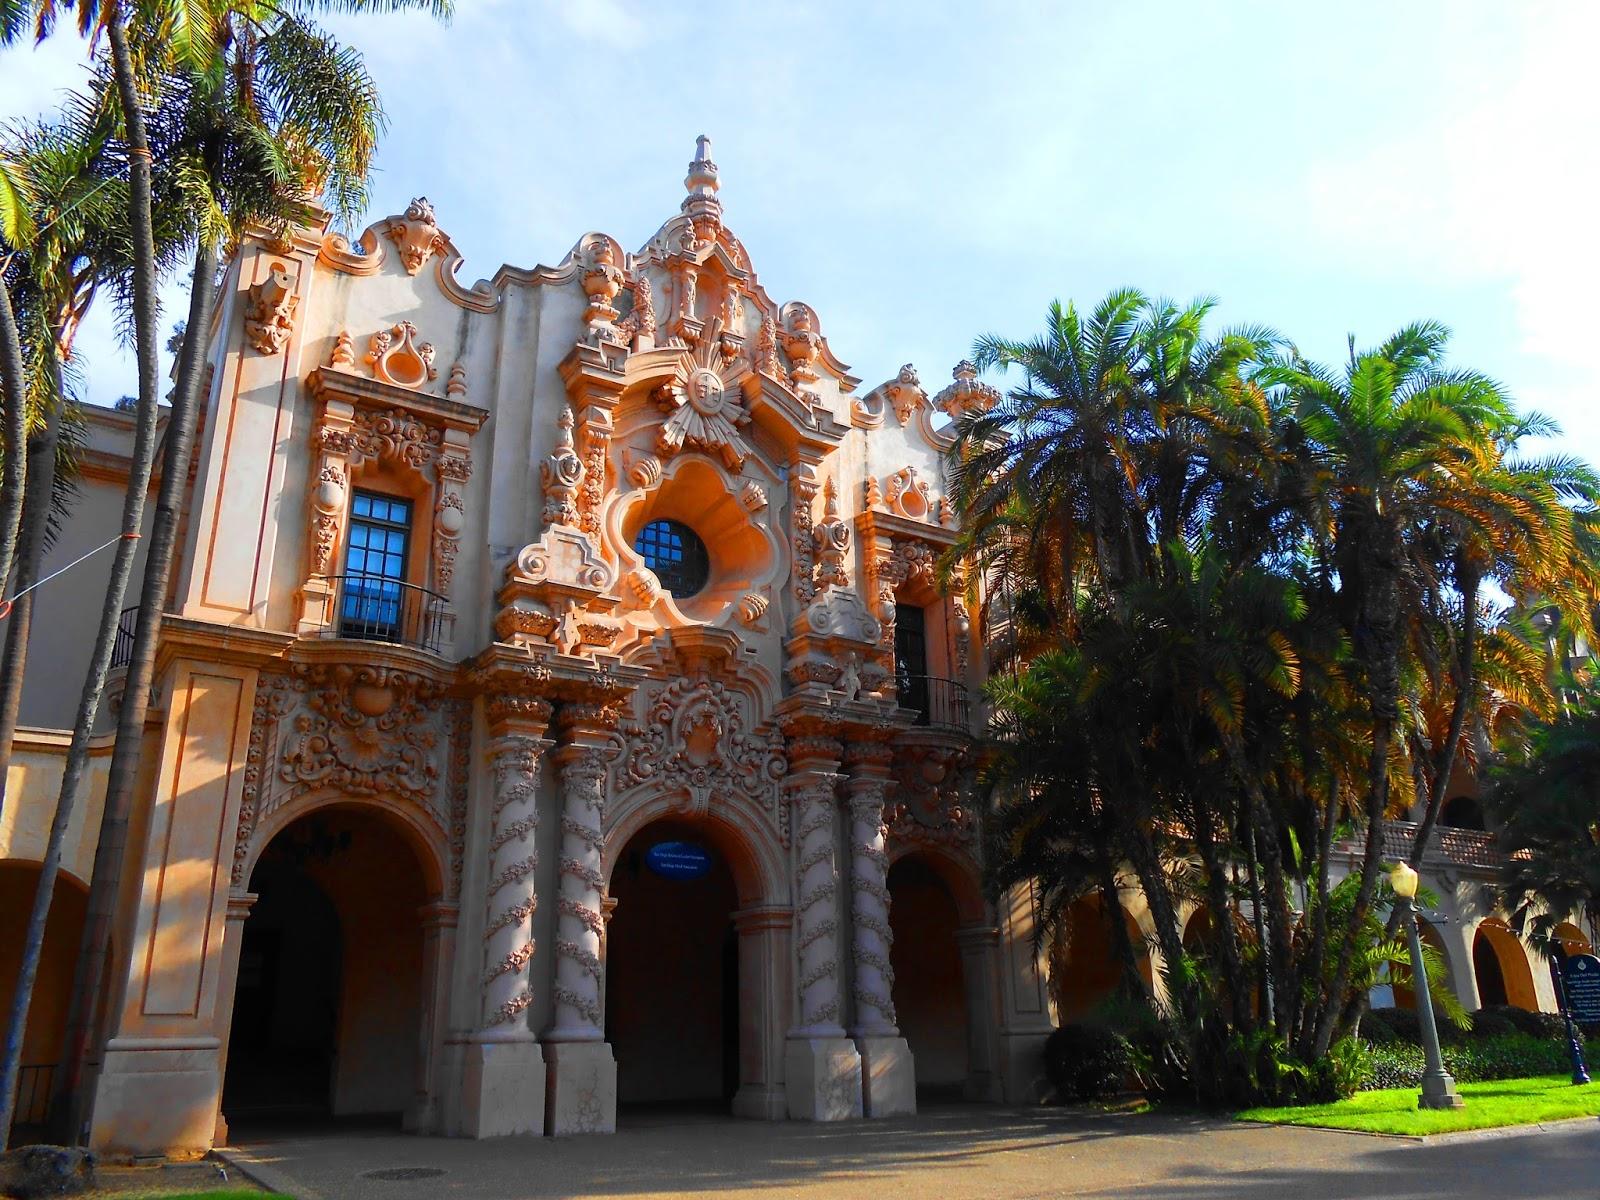 Casa Del Prado Balboa Park